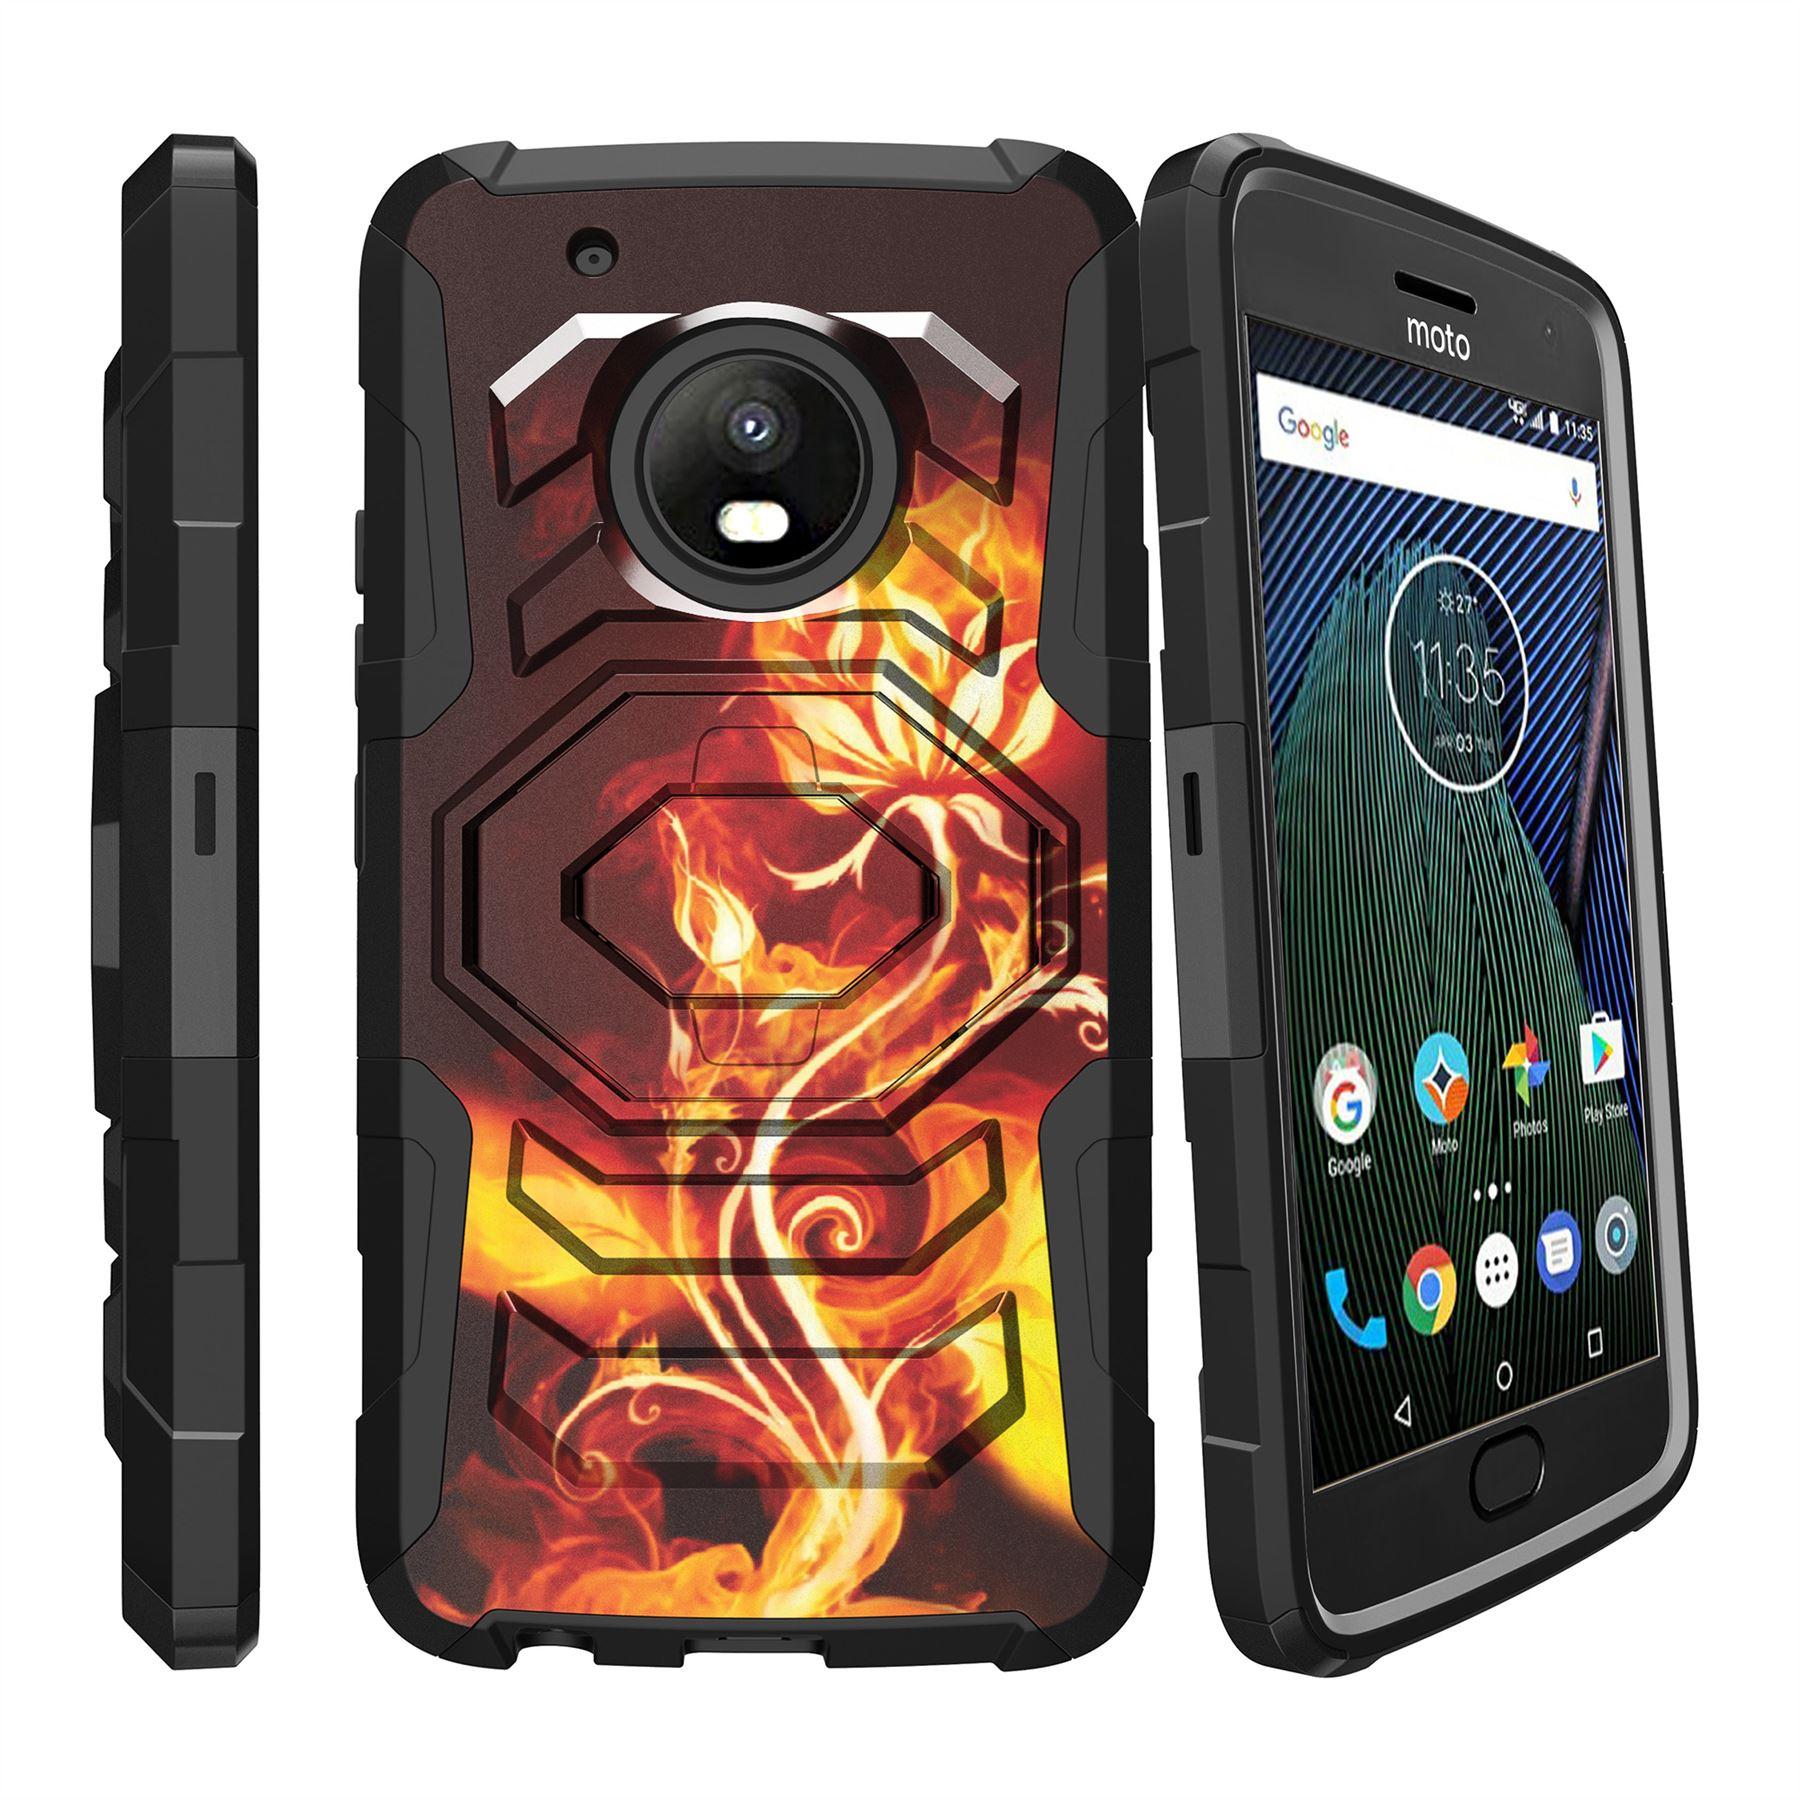 For Motorola Moto G5 Plus | Moto G5 Plus | XT1687 Clip Stand Case Red Hearts | eBay